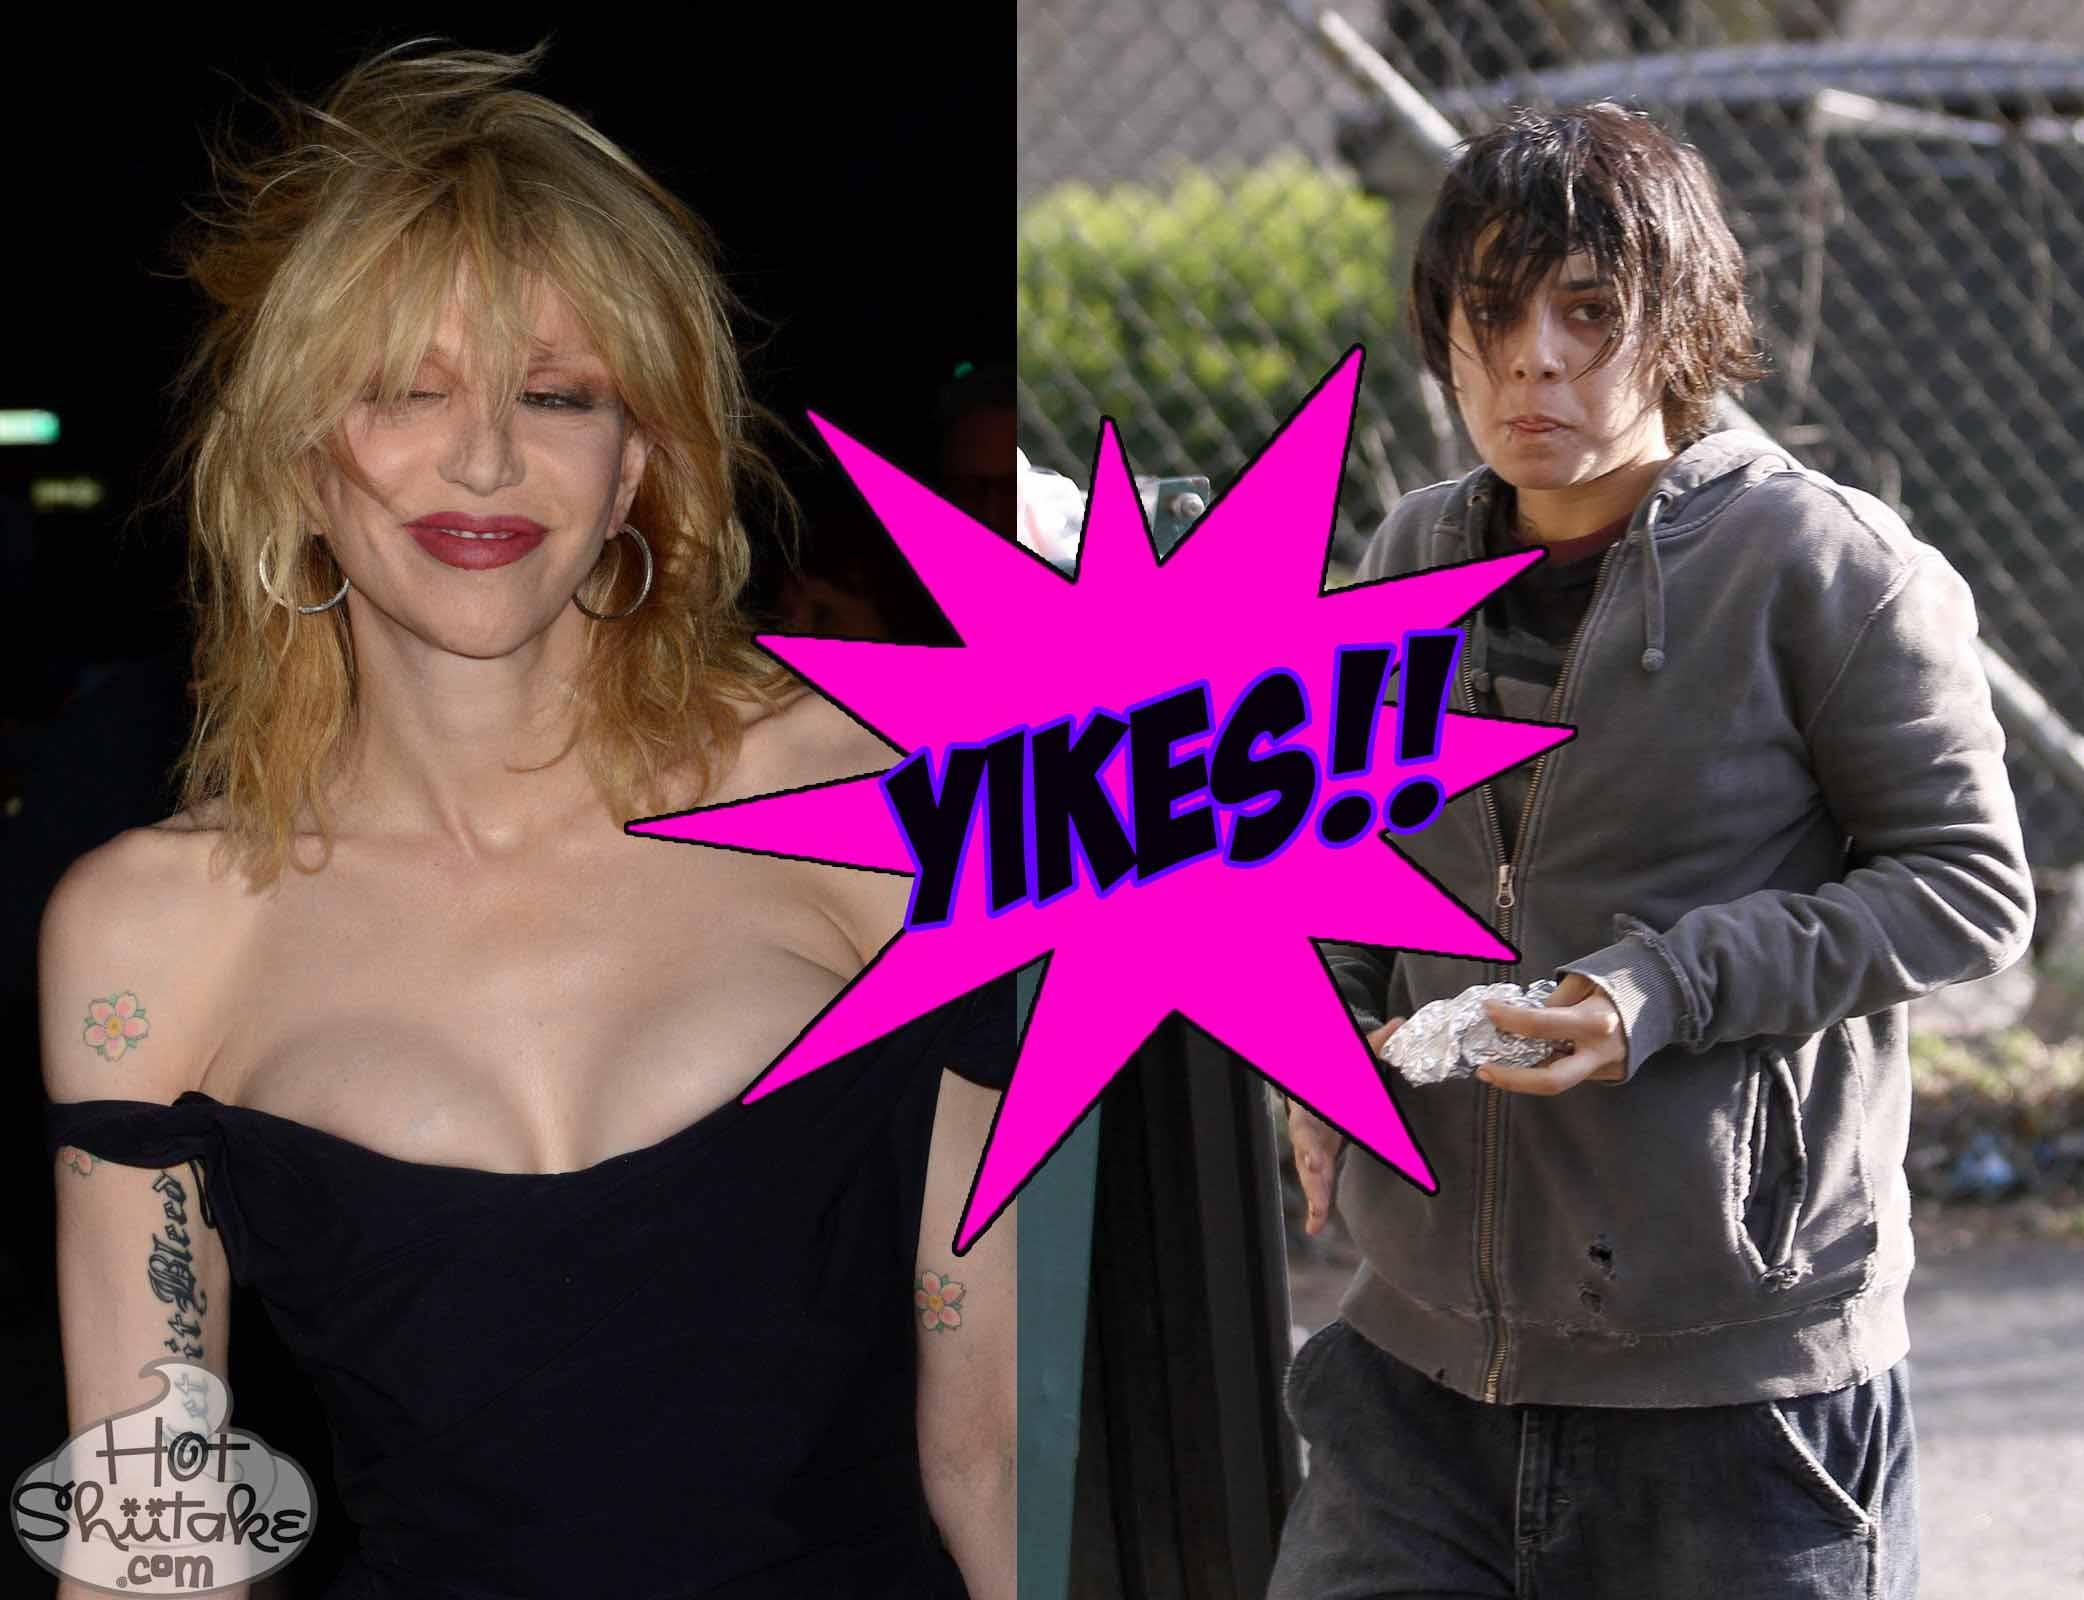 Ugly Celebrity Pics